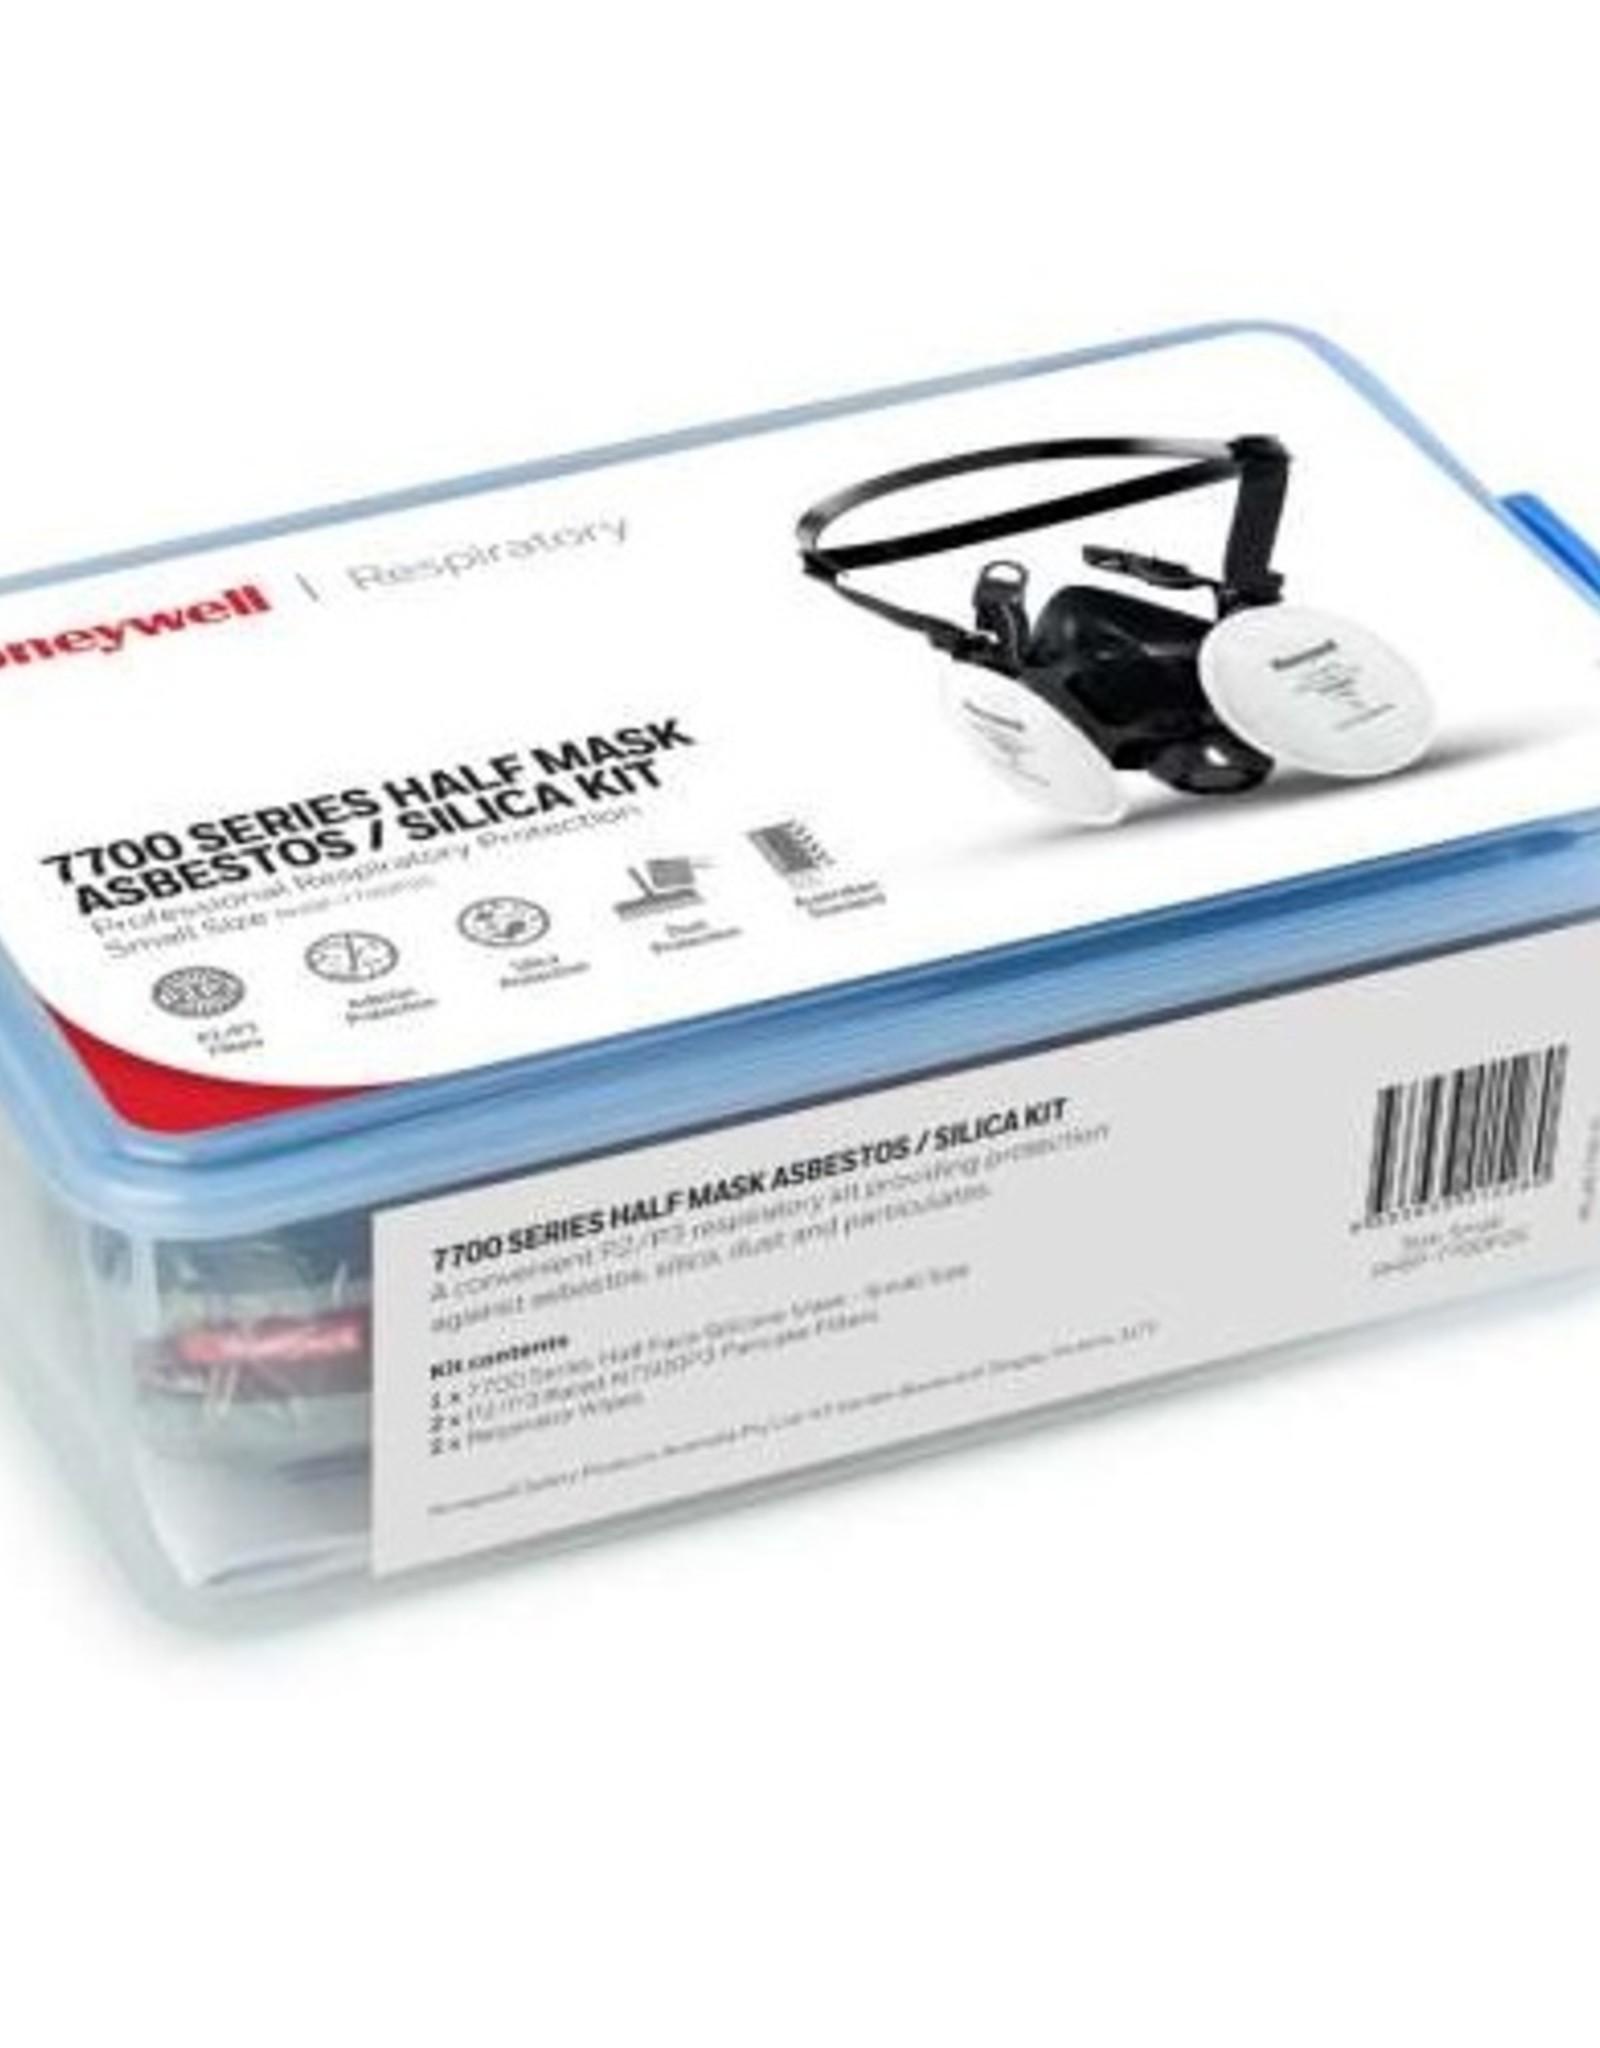 Honeywell Honeywell 7700 Half Mask Asbestos / Silica Kit - Large